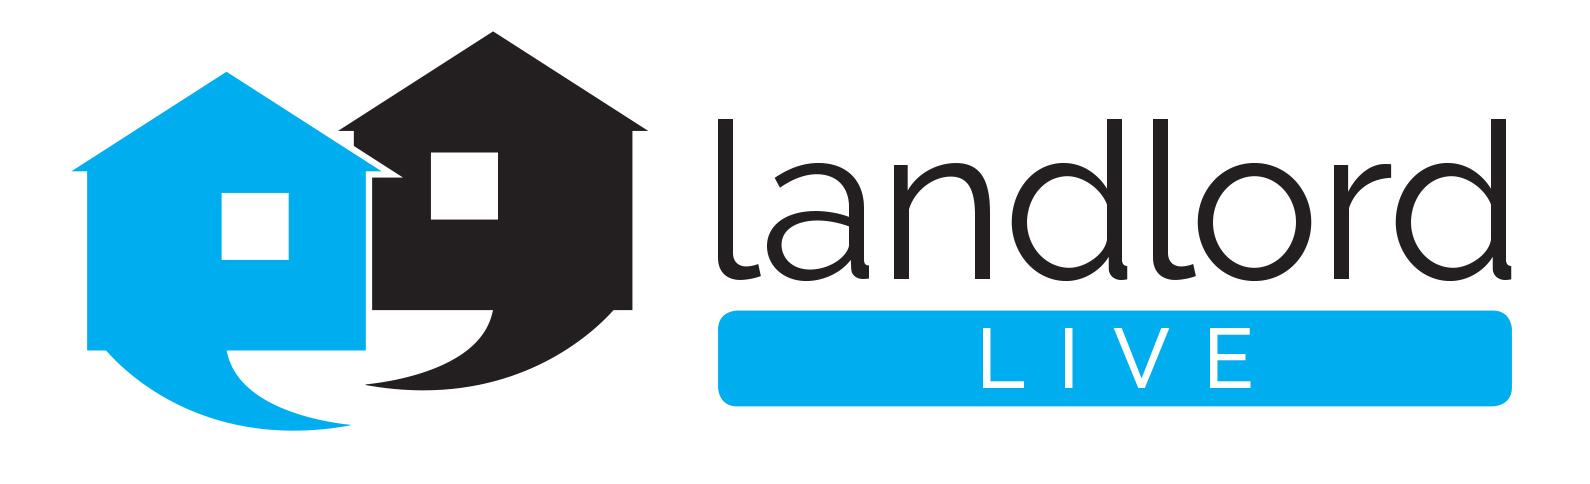 Landlord Live